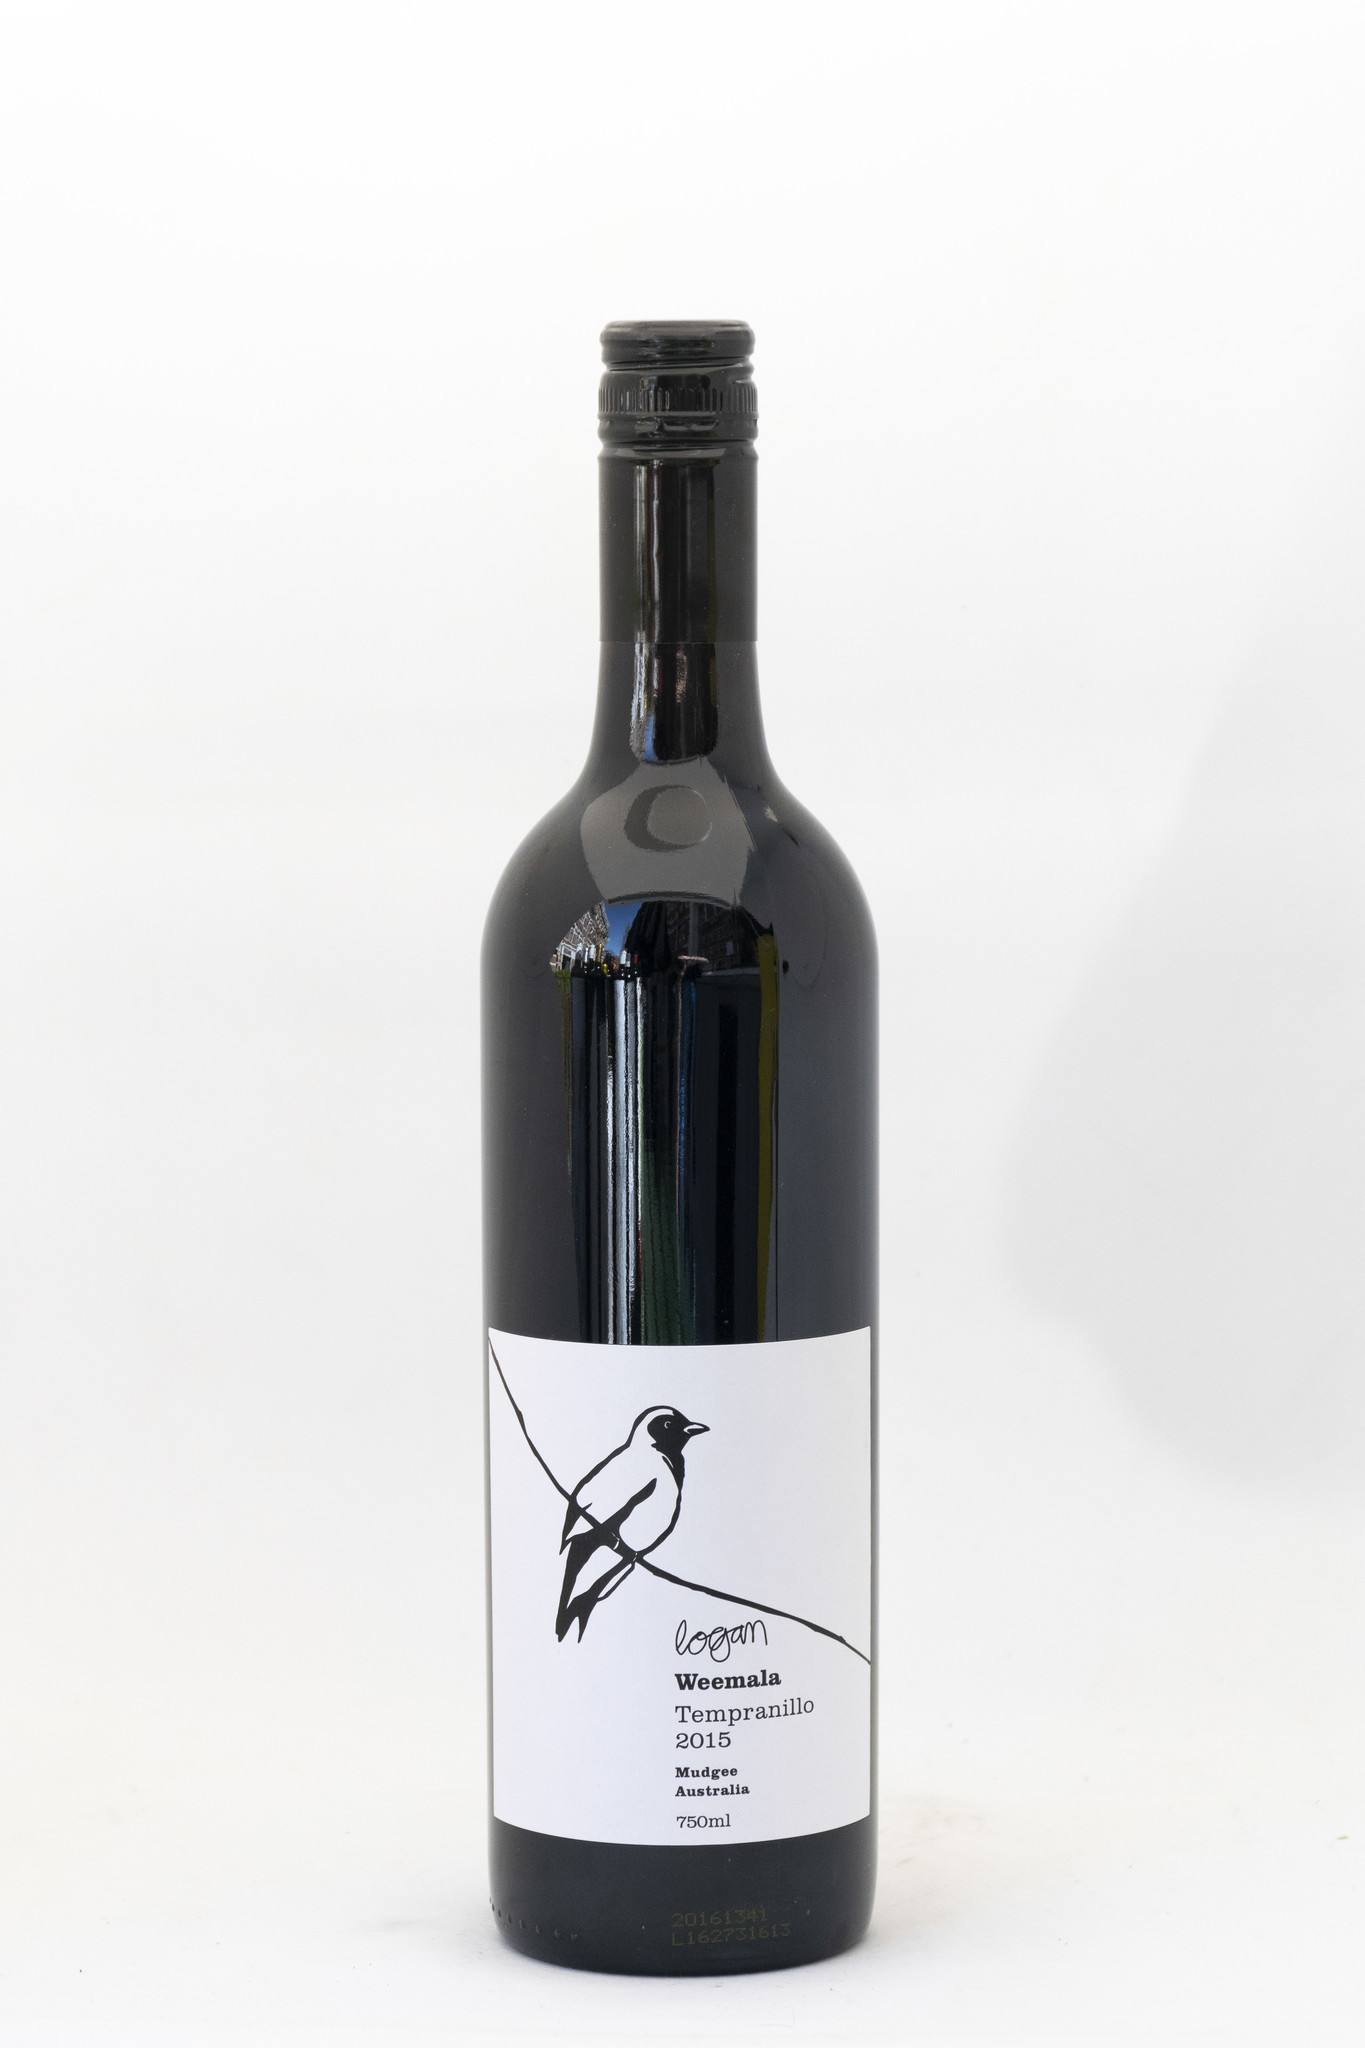 Cucko Strike | Weemala | Logan wines | Tempranillo|2015